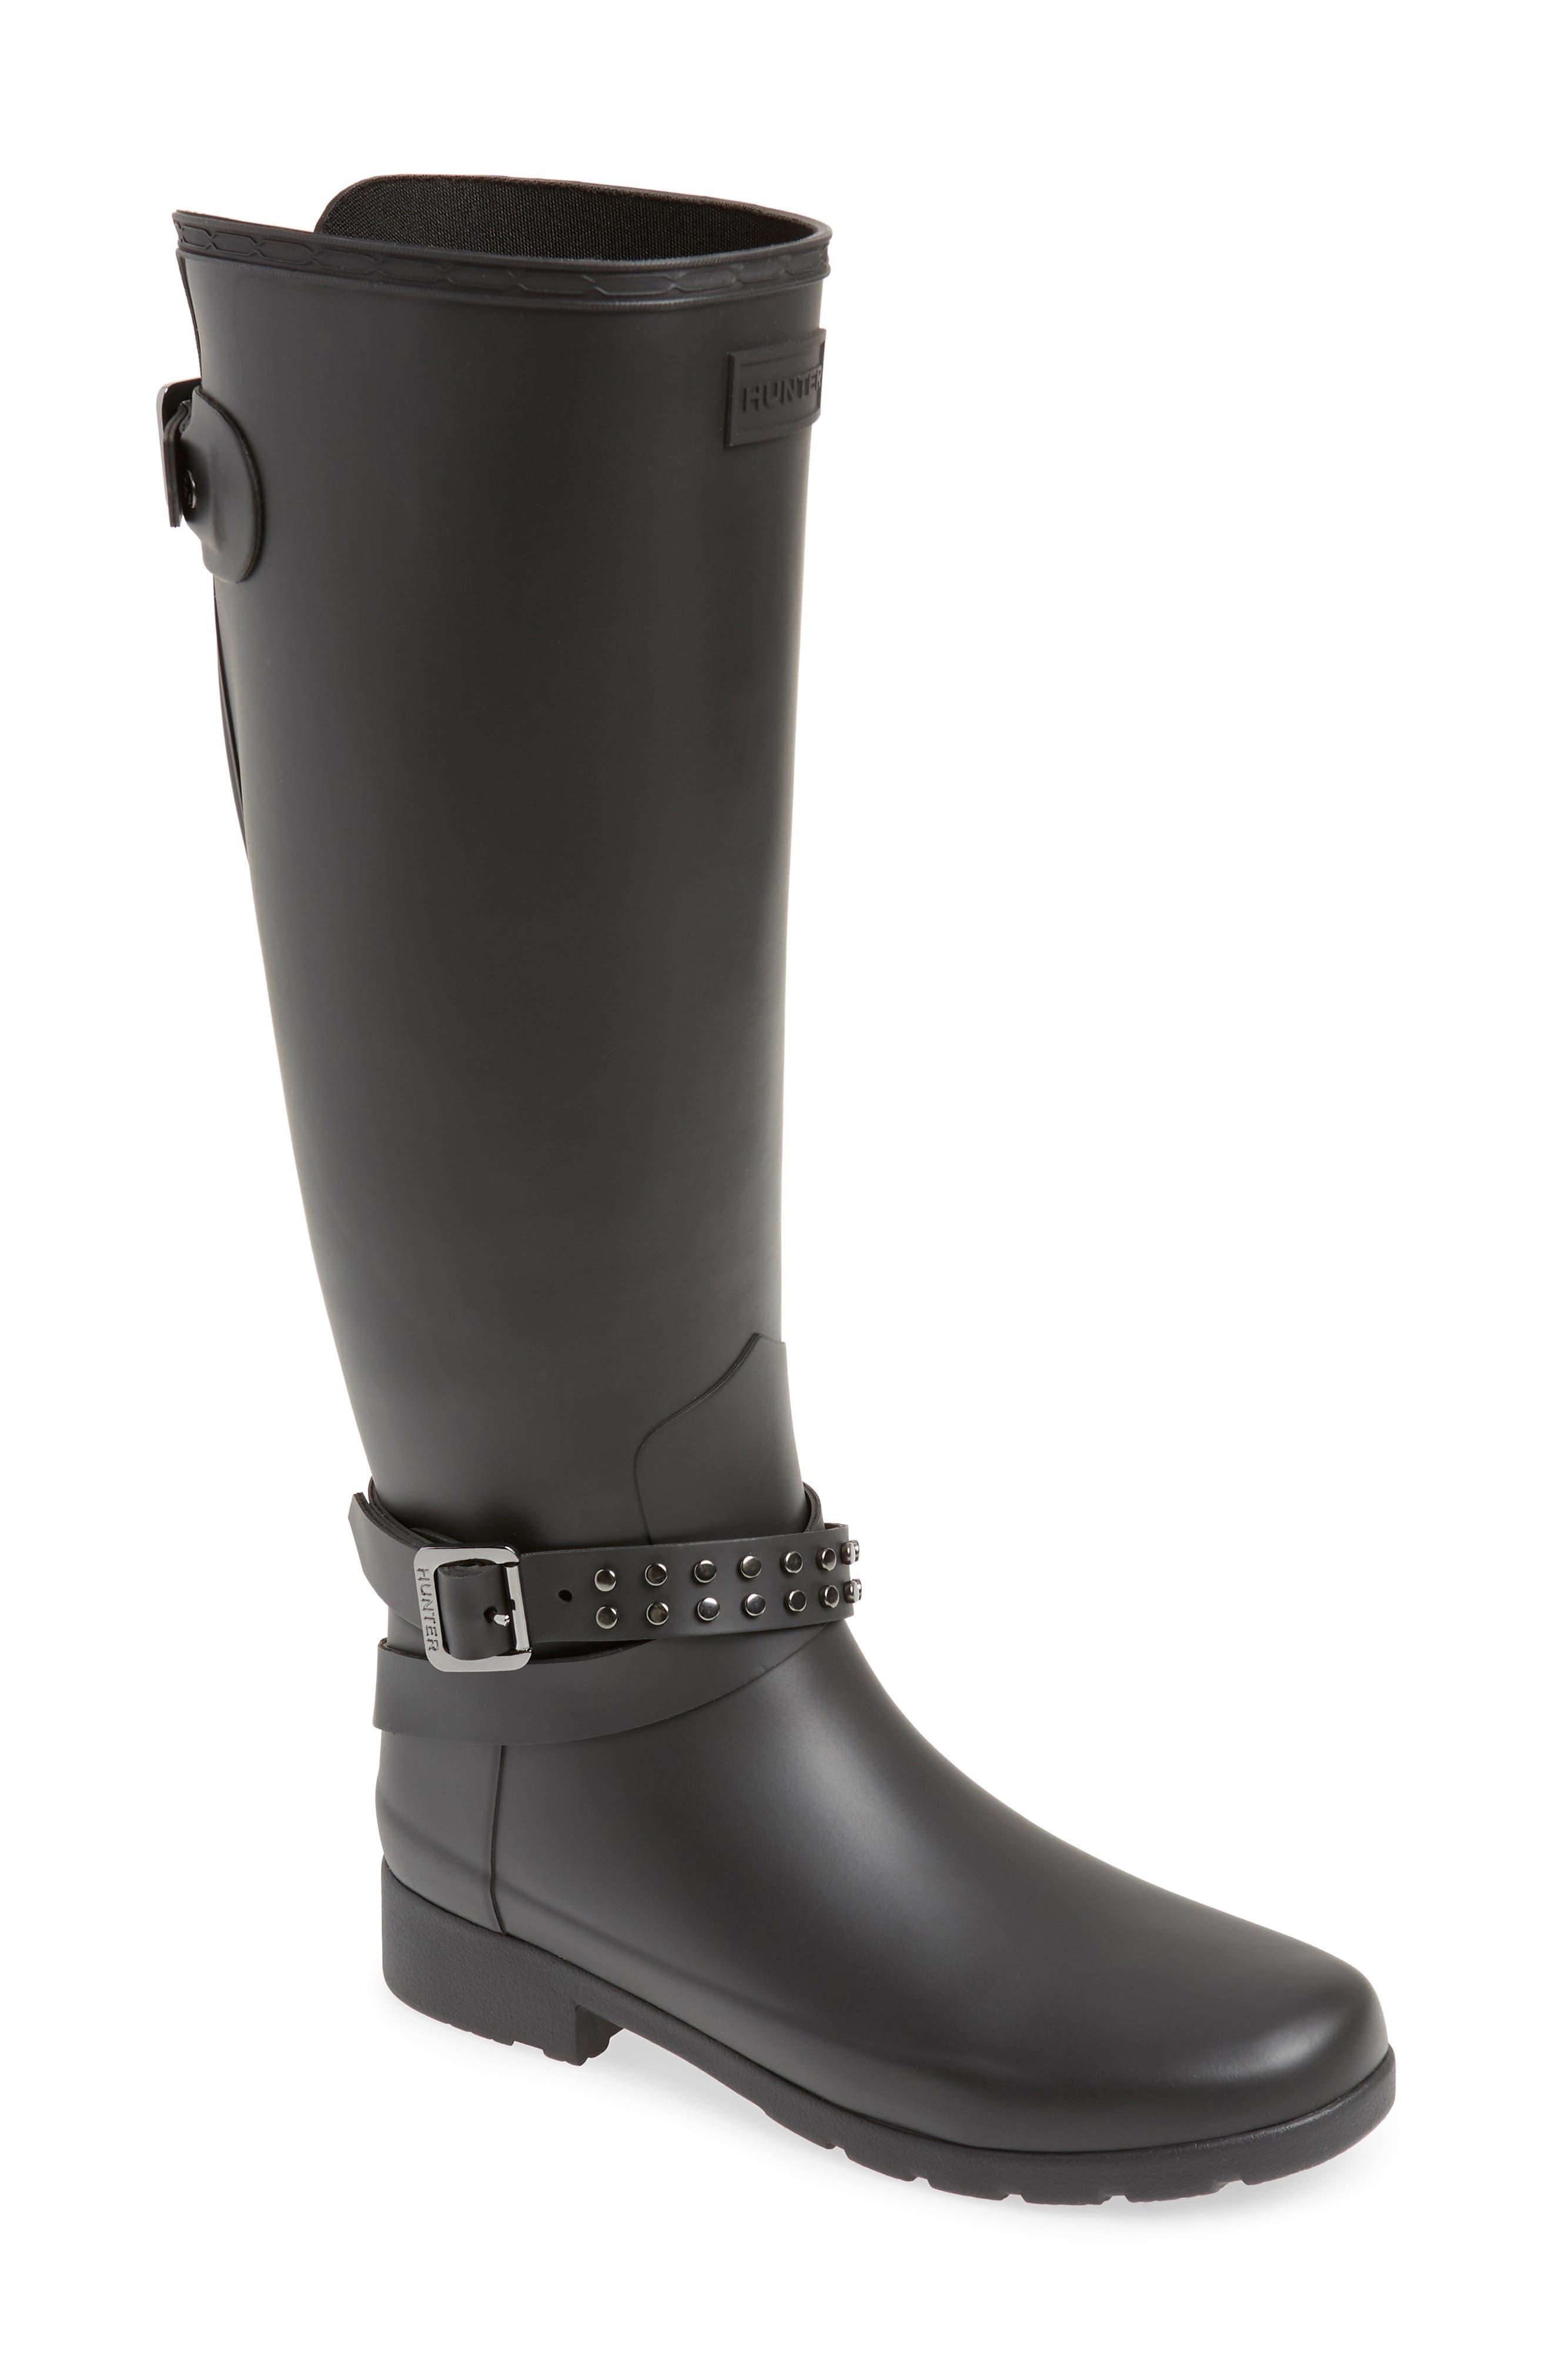 HUNTER Refined Adjustable Back Knee High Waterproof Rain Boot, Main, color, BLACK